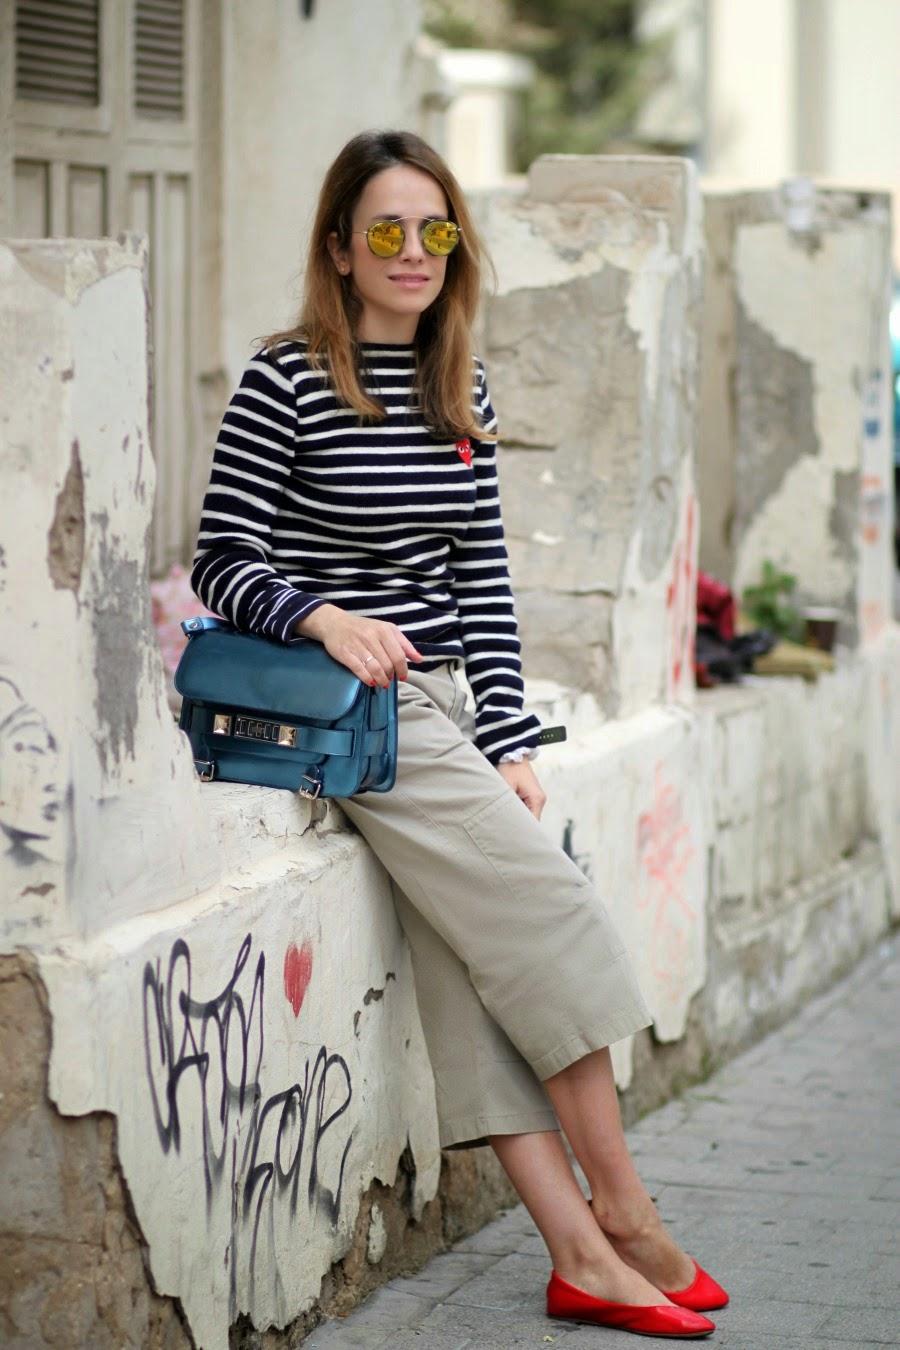 it'smyparty, Comme des garcons, proenza schouler, illesteva, birthday, streetstyle, fashionblog, kissandhugs, בלוגאופנה, אופנה